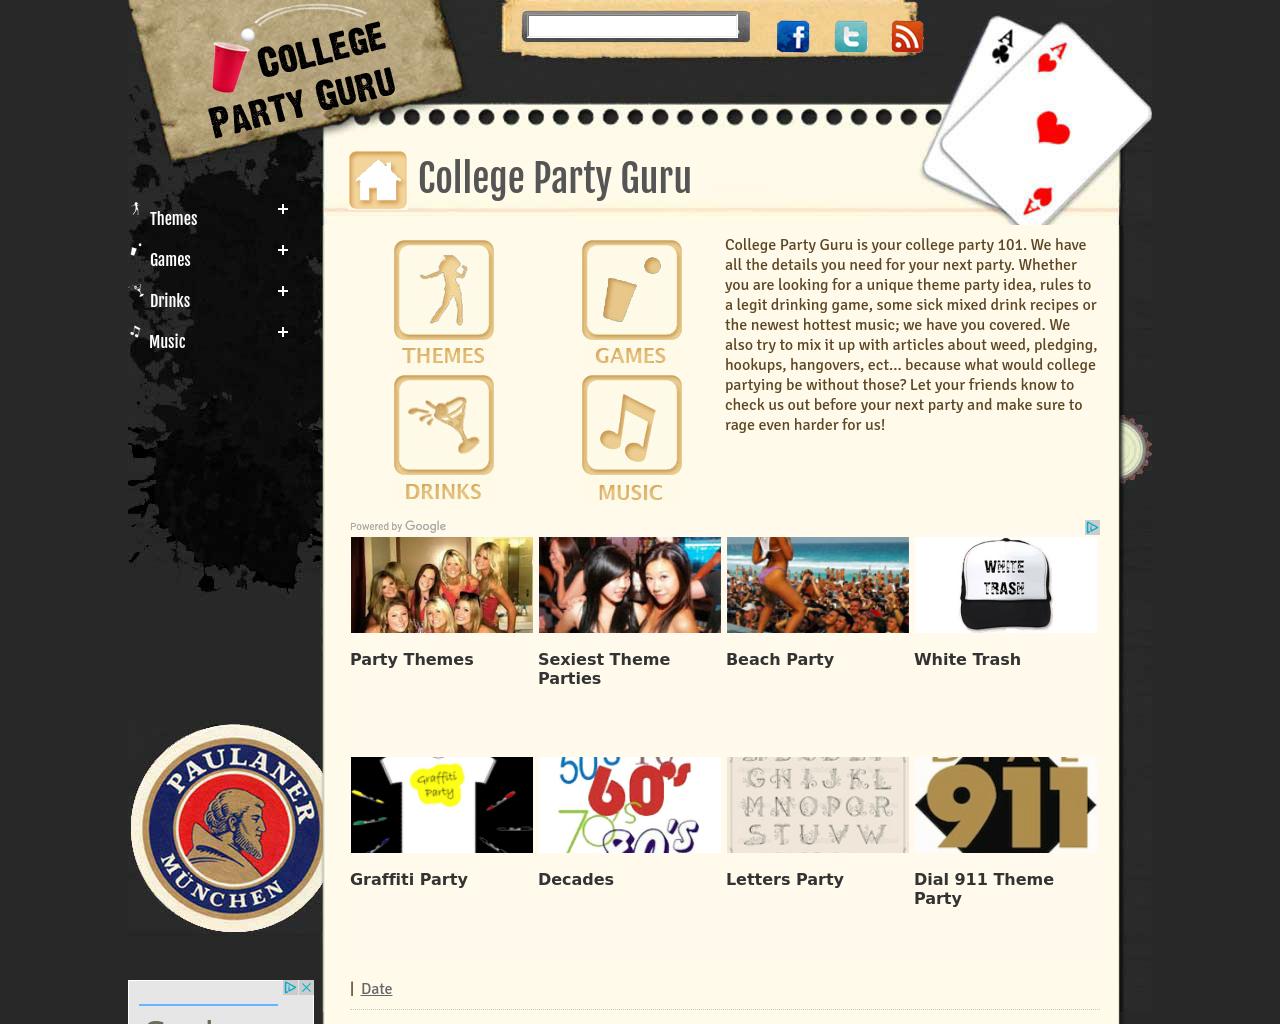 College-Party-Guru-Advertising-Reviews-Pricing